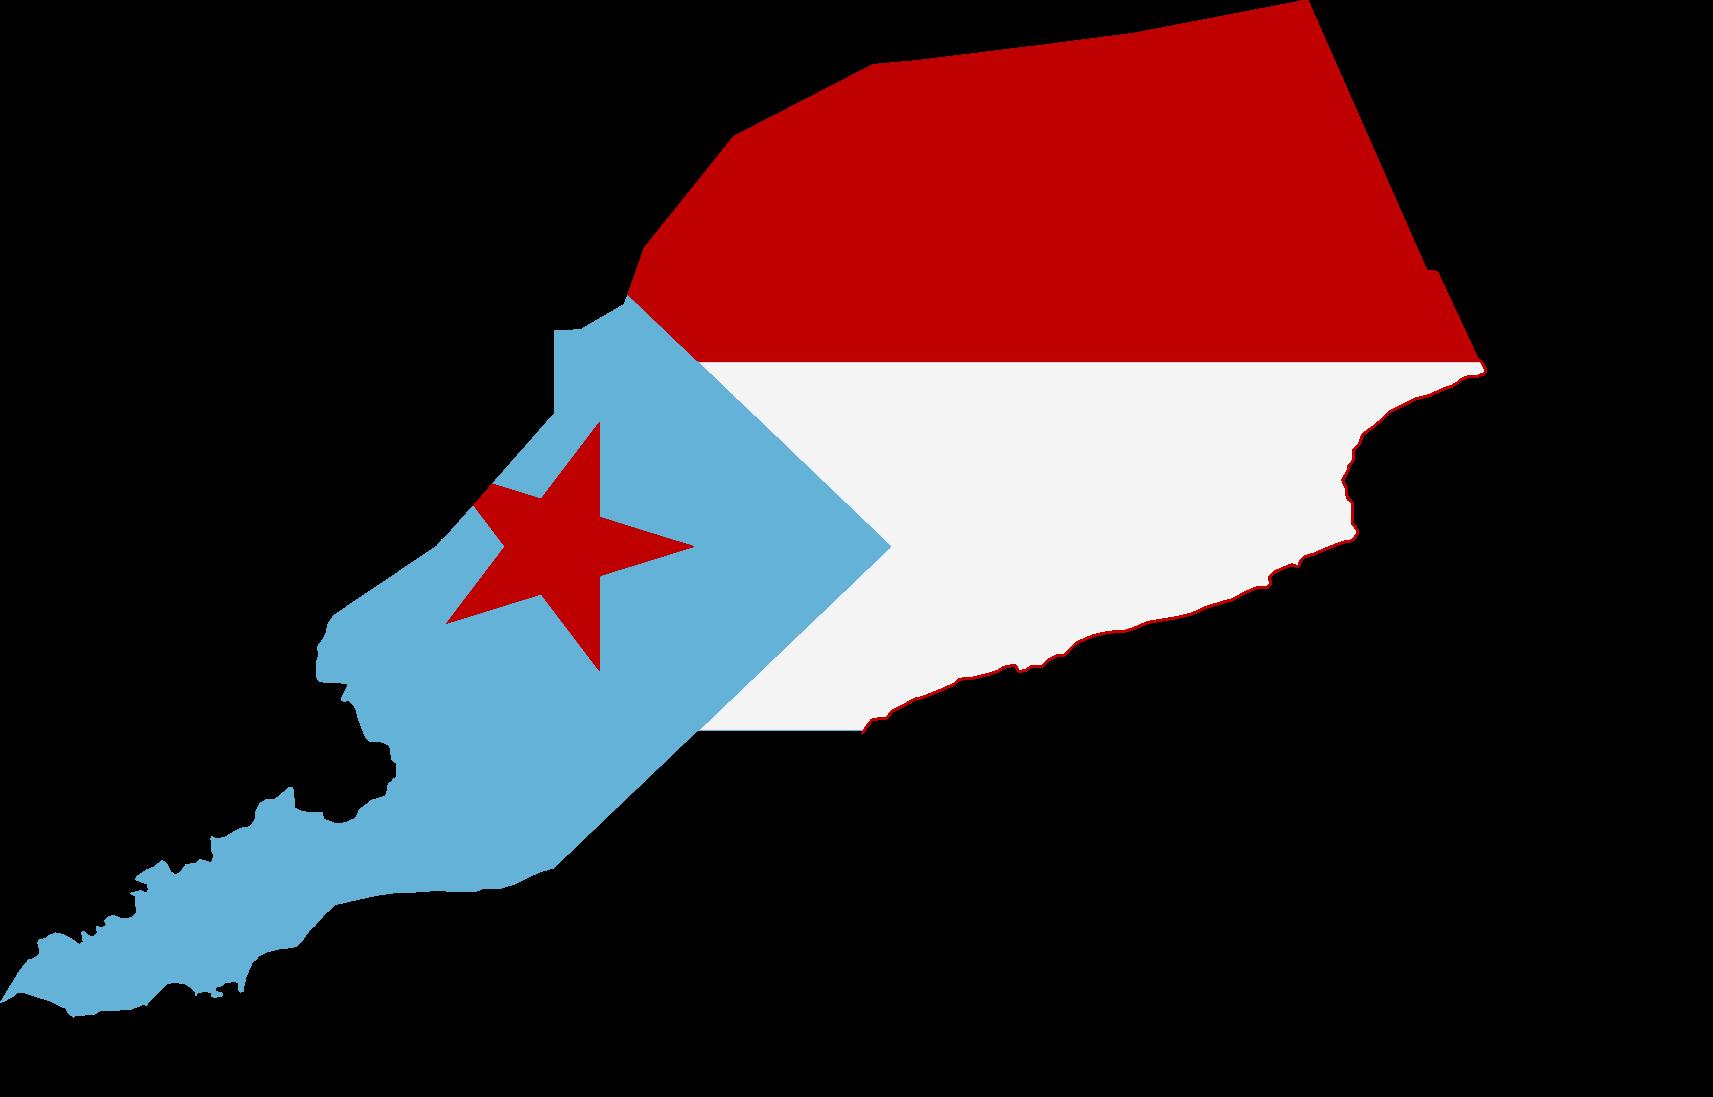 FileFlag Map Of South Yemen Png Wikimedia Commons - Yemen map png